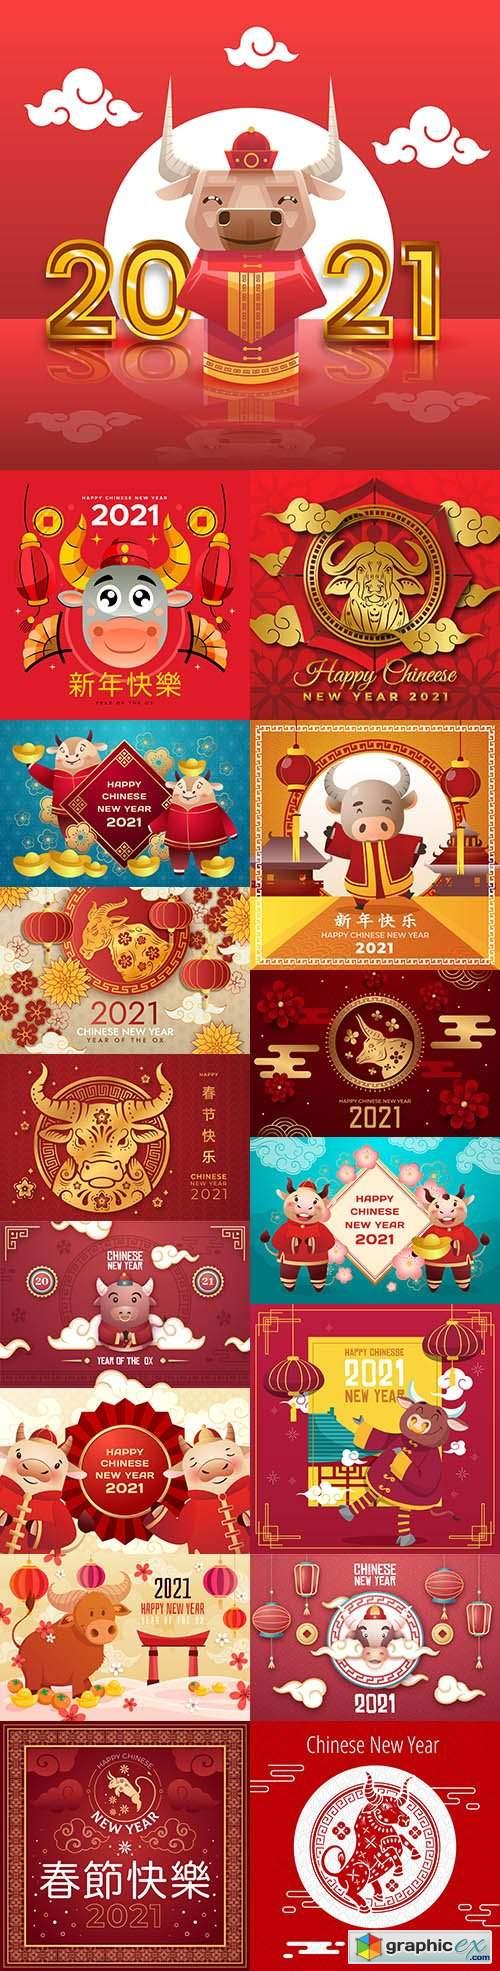 Chinese festive New Year 2021 symbol bull design 6